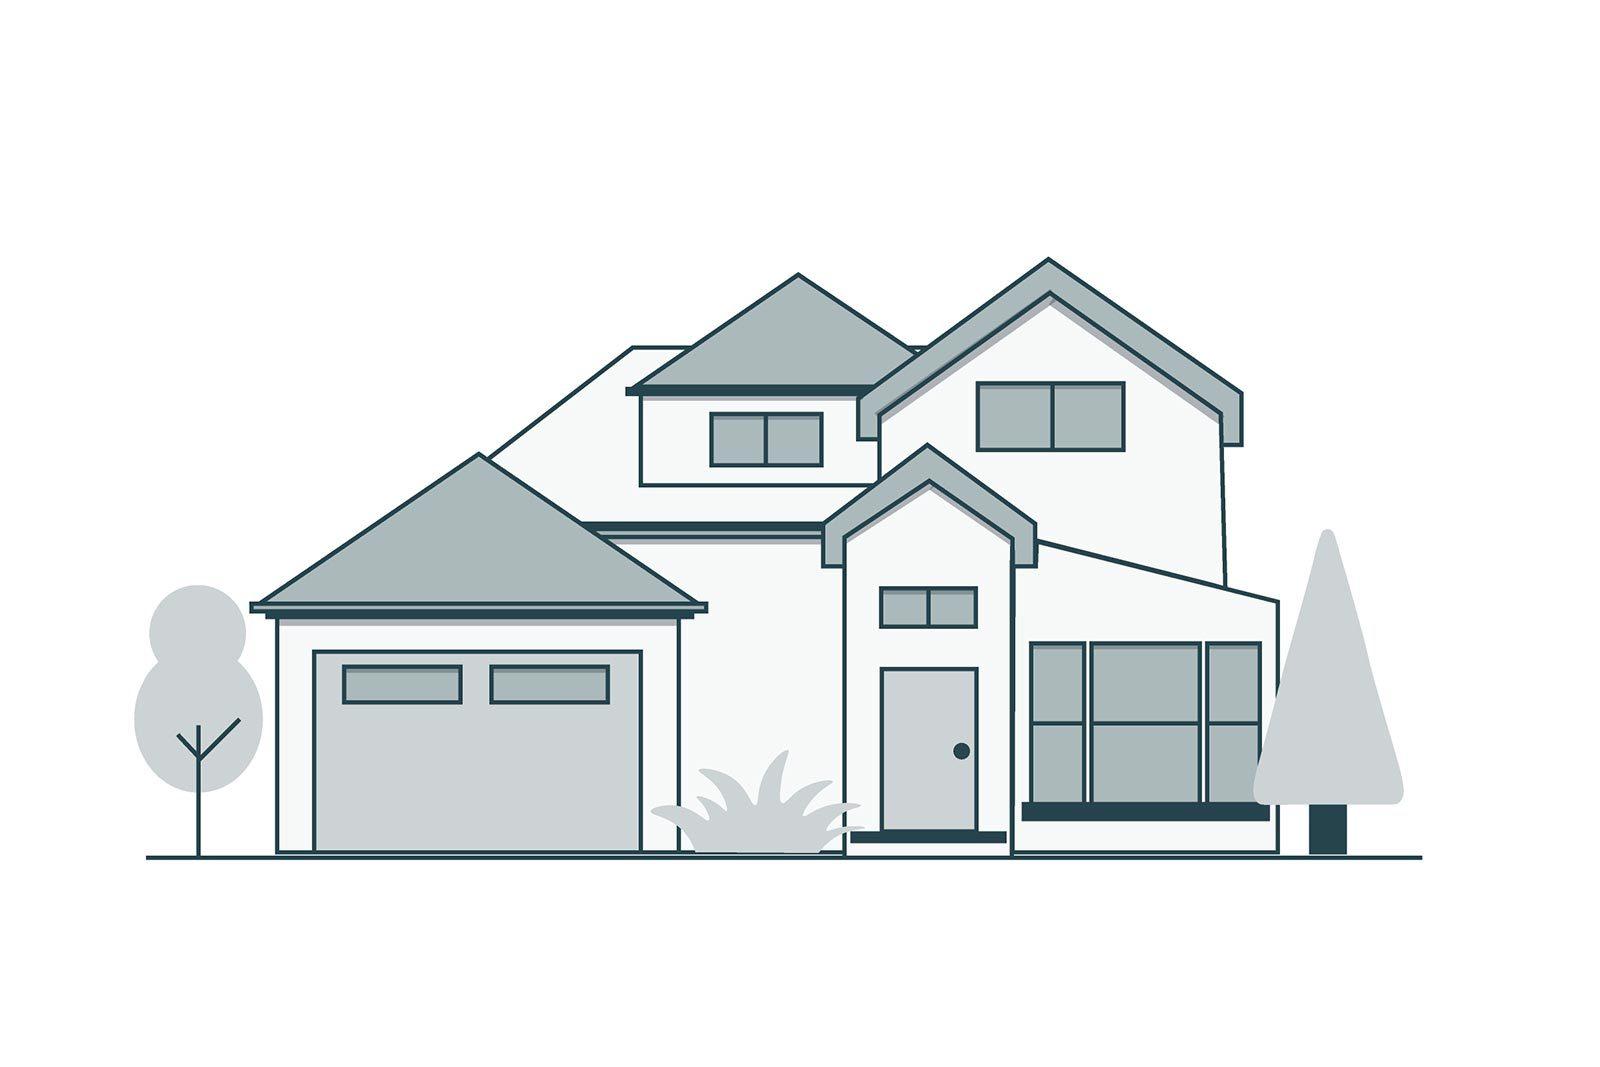 143 Laidley Street San Francisco, CA 94131